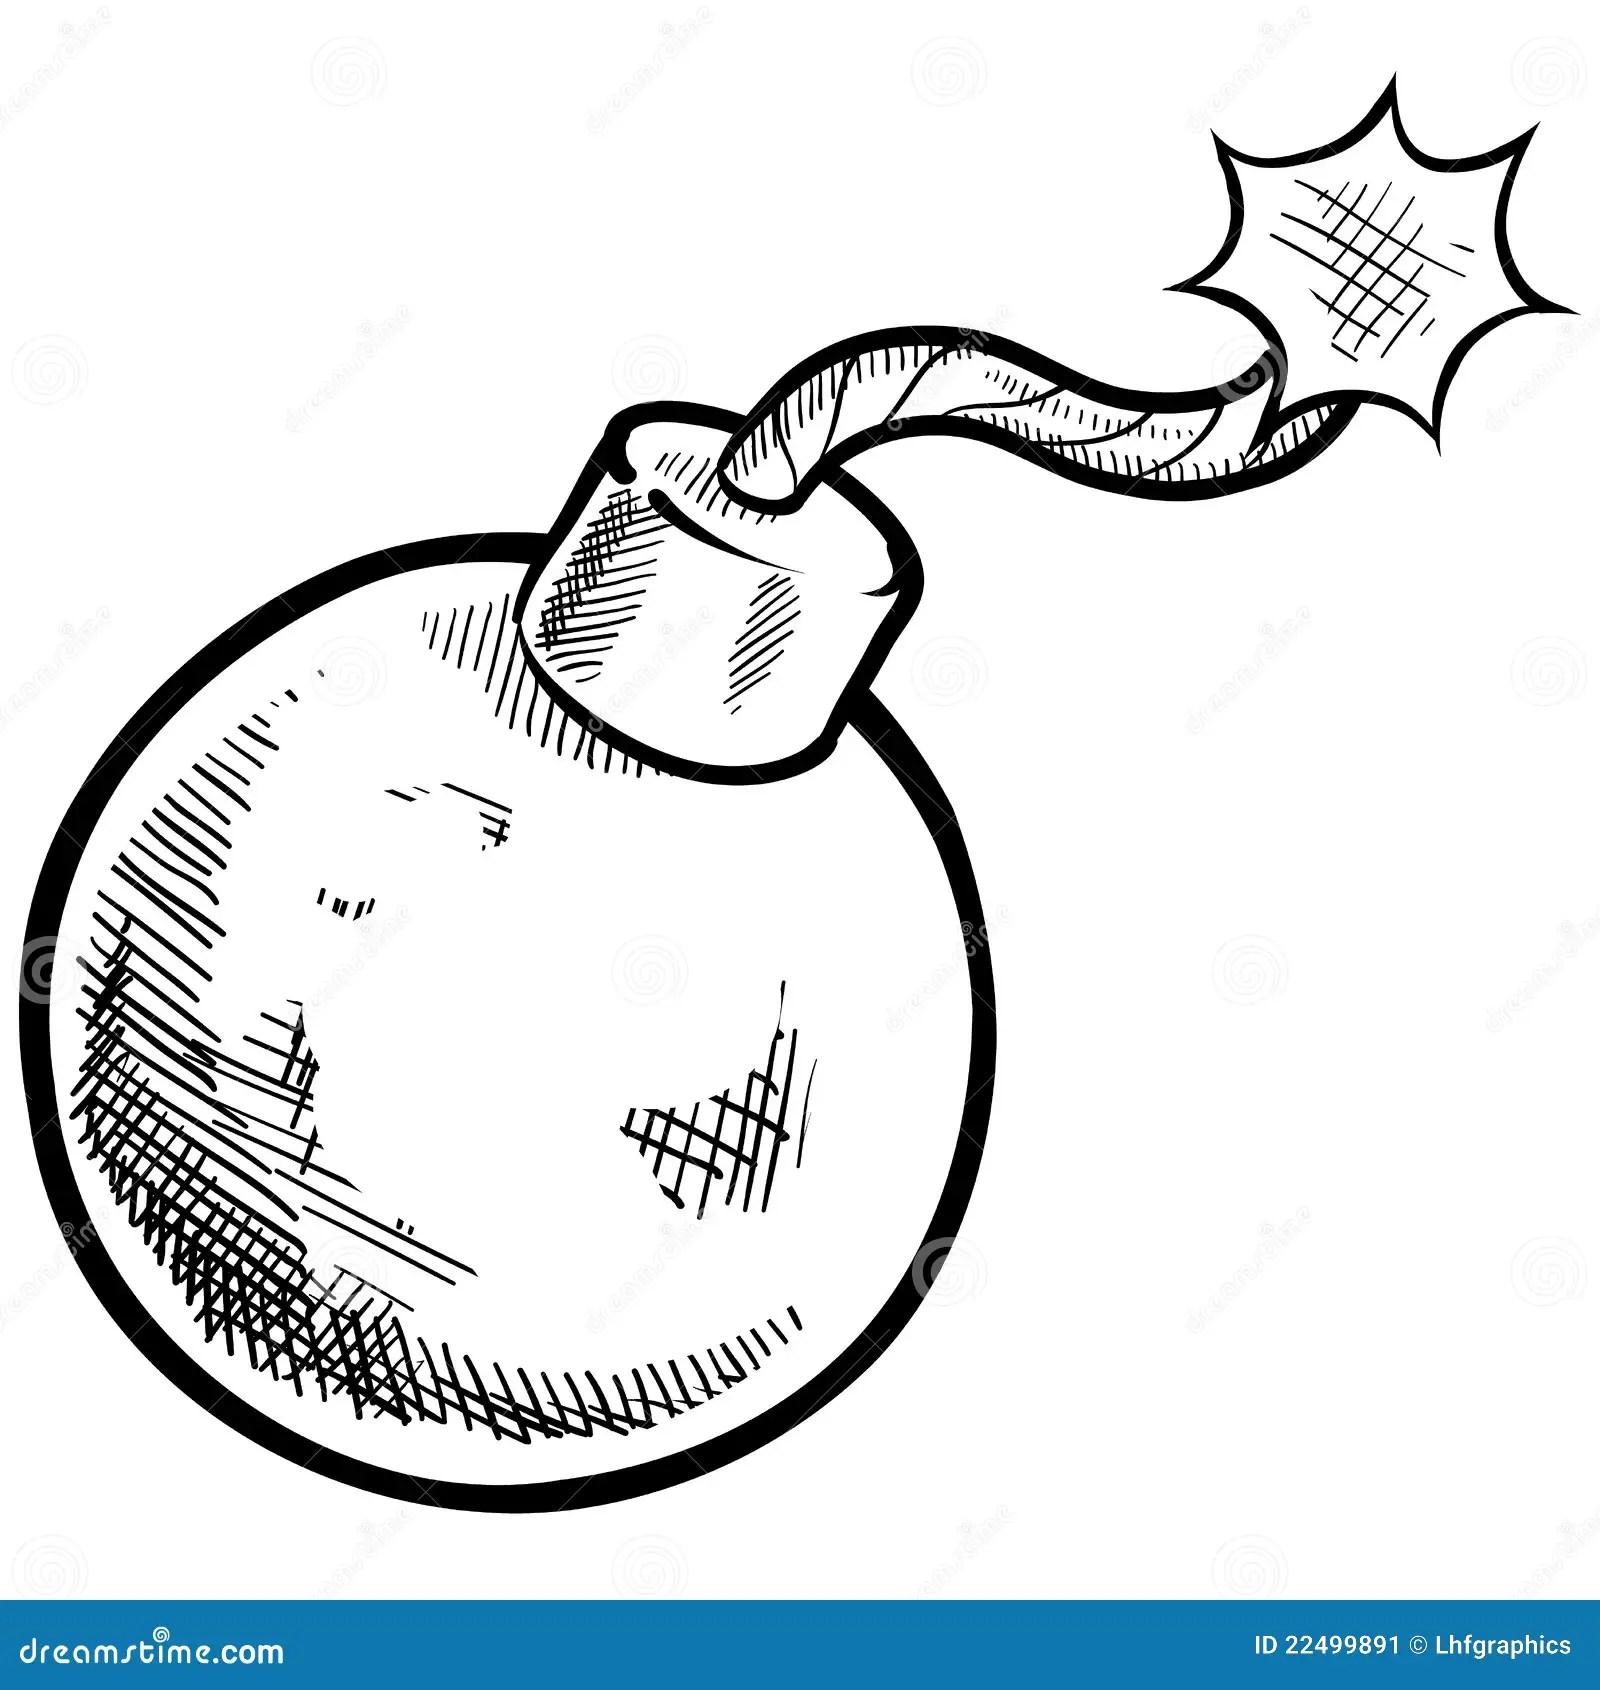 Retro Drawing Stock Image